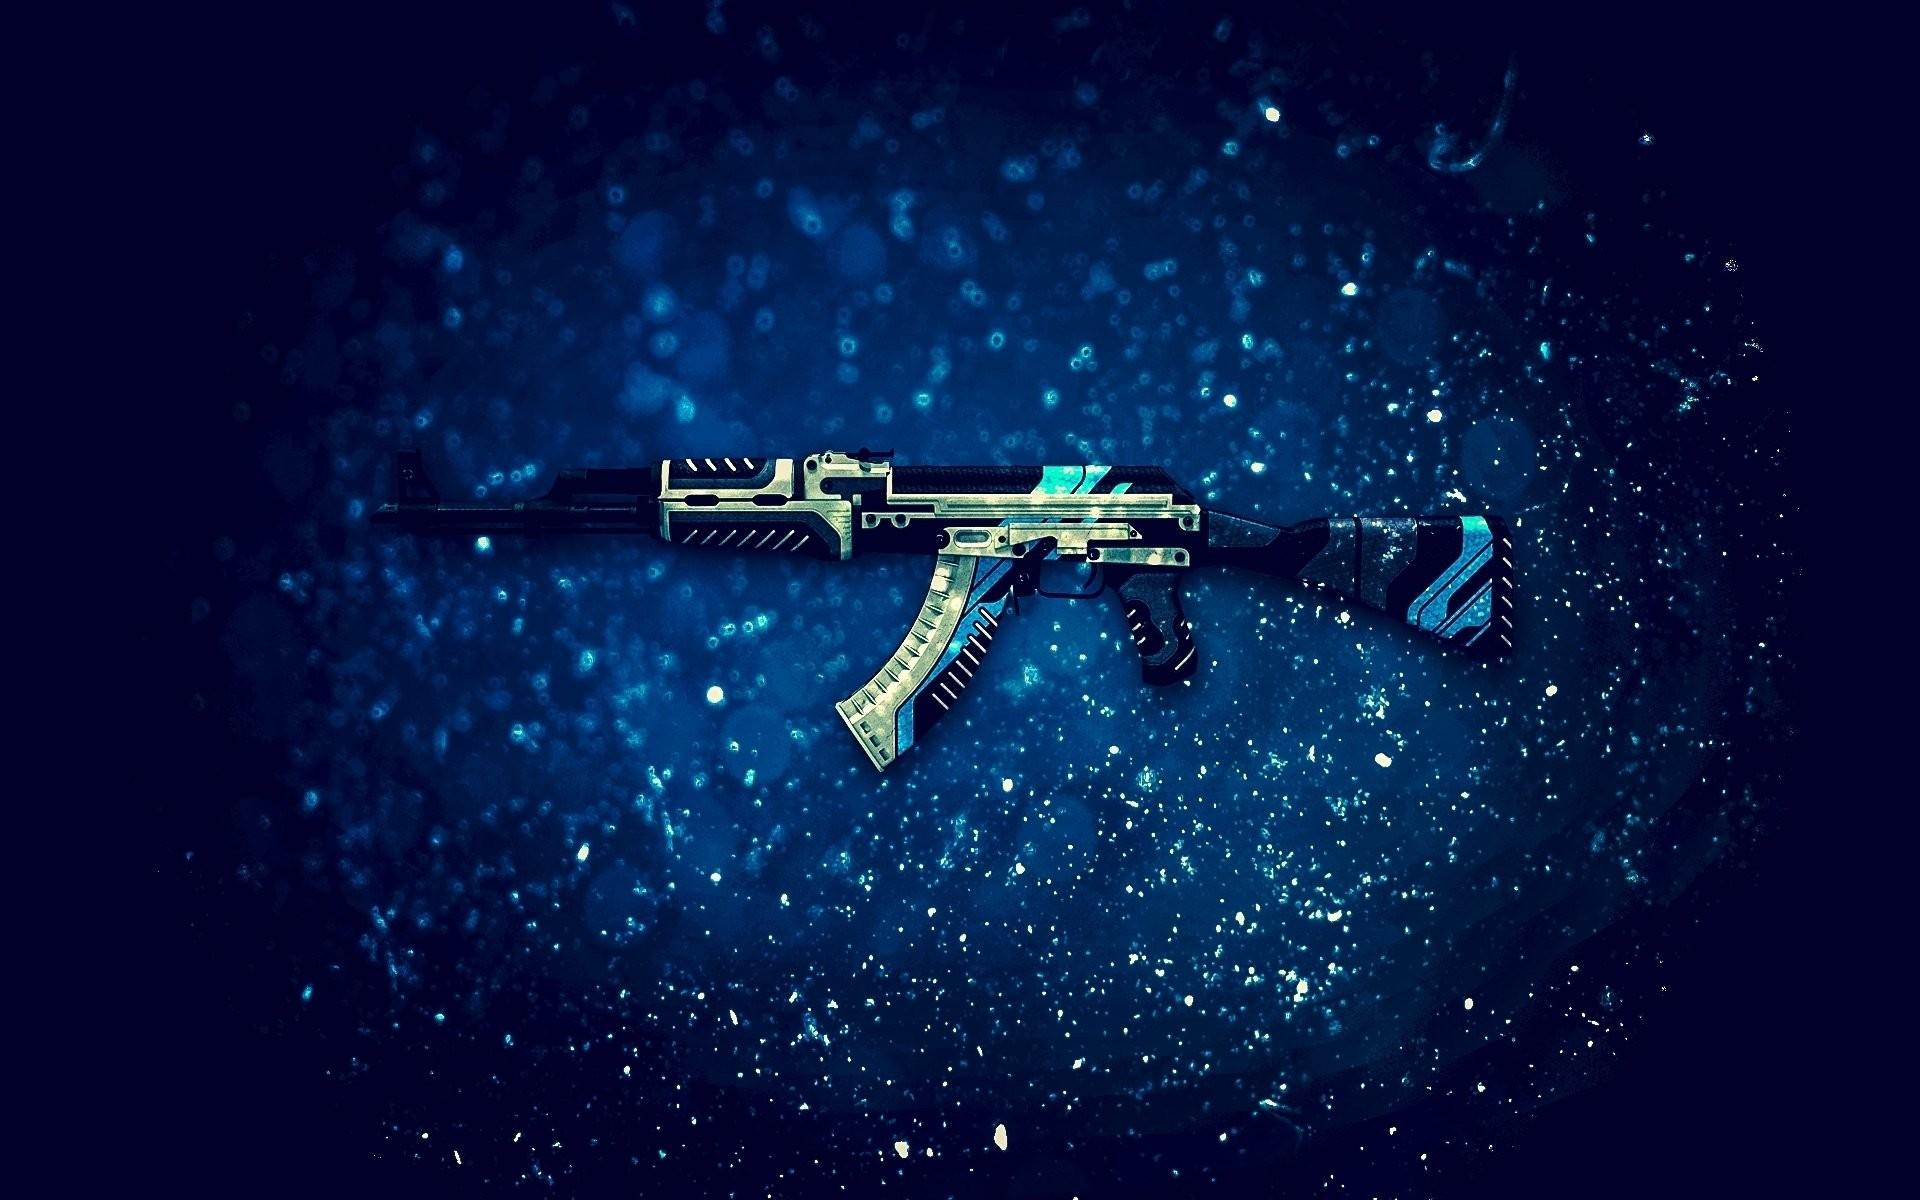 Operation Hydra for CS:GO #games #globaloffensive #CSGO #counterstrike  #hltv #CS #steam #Valve #djswat #CS16 | Counter-Strike: Global Offensive |  Pinterest …